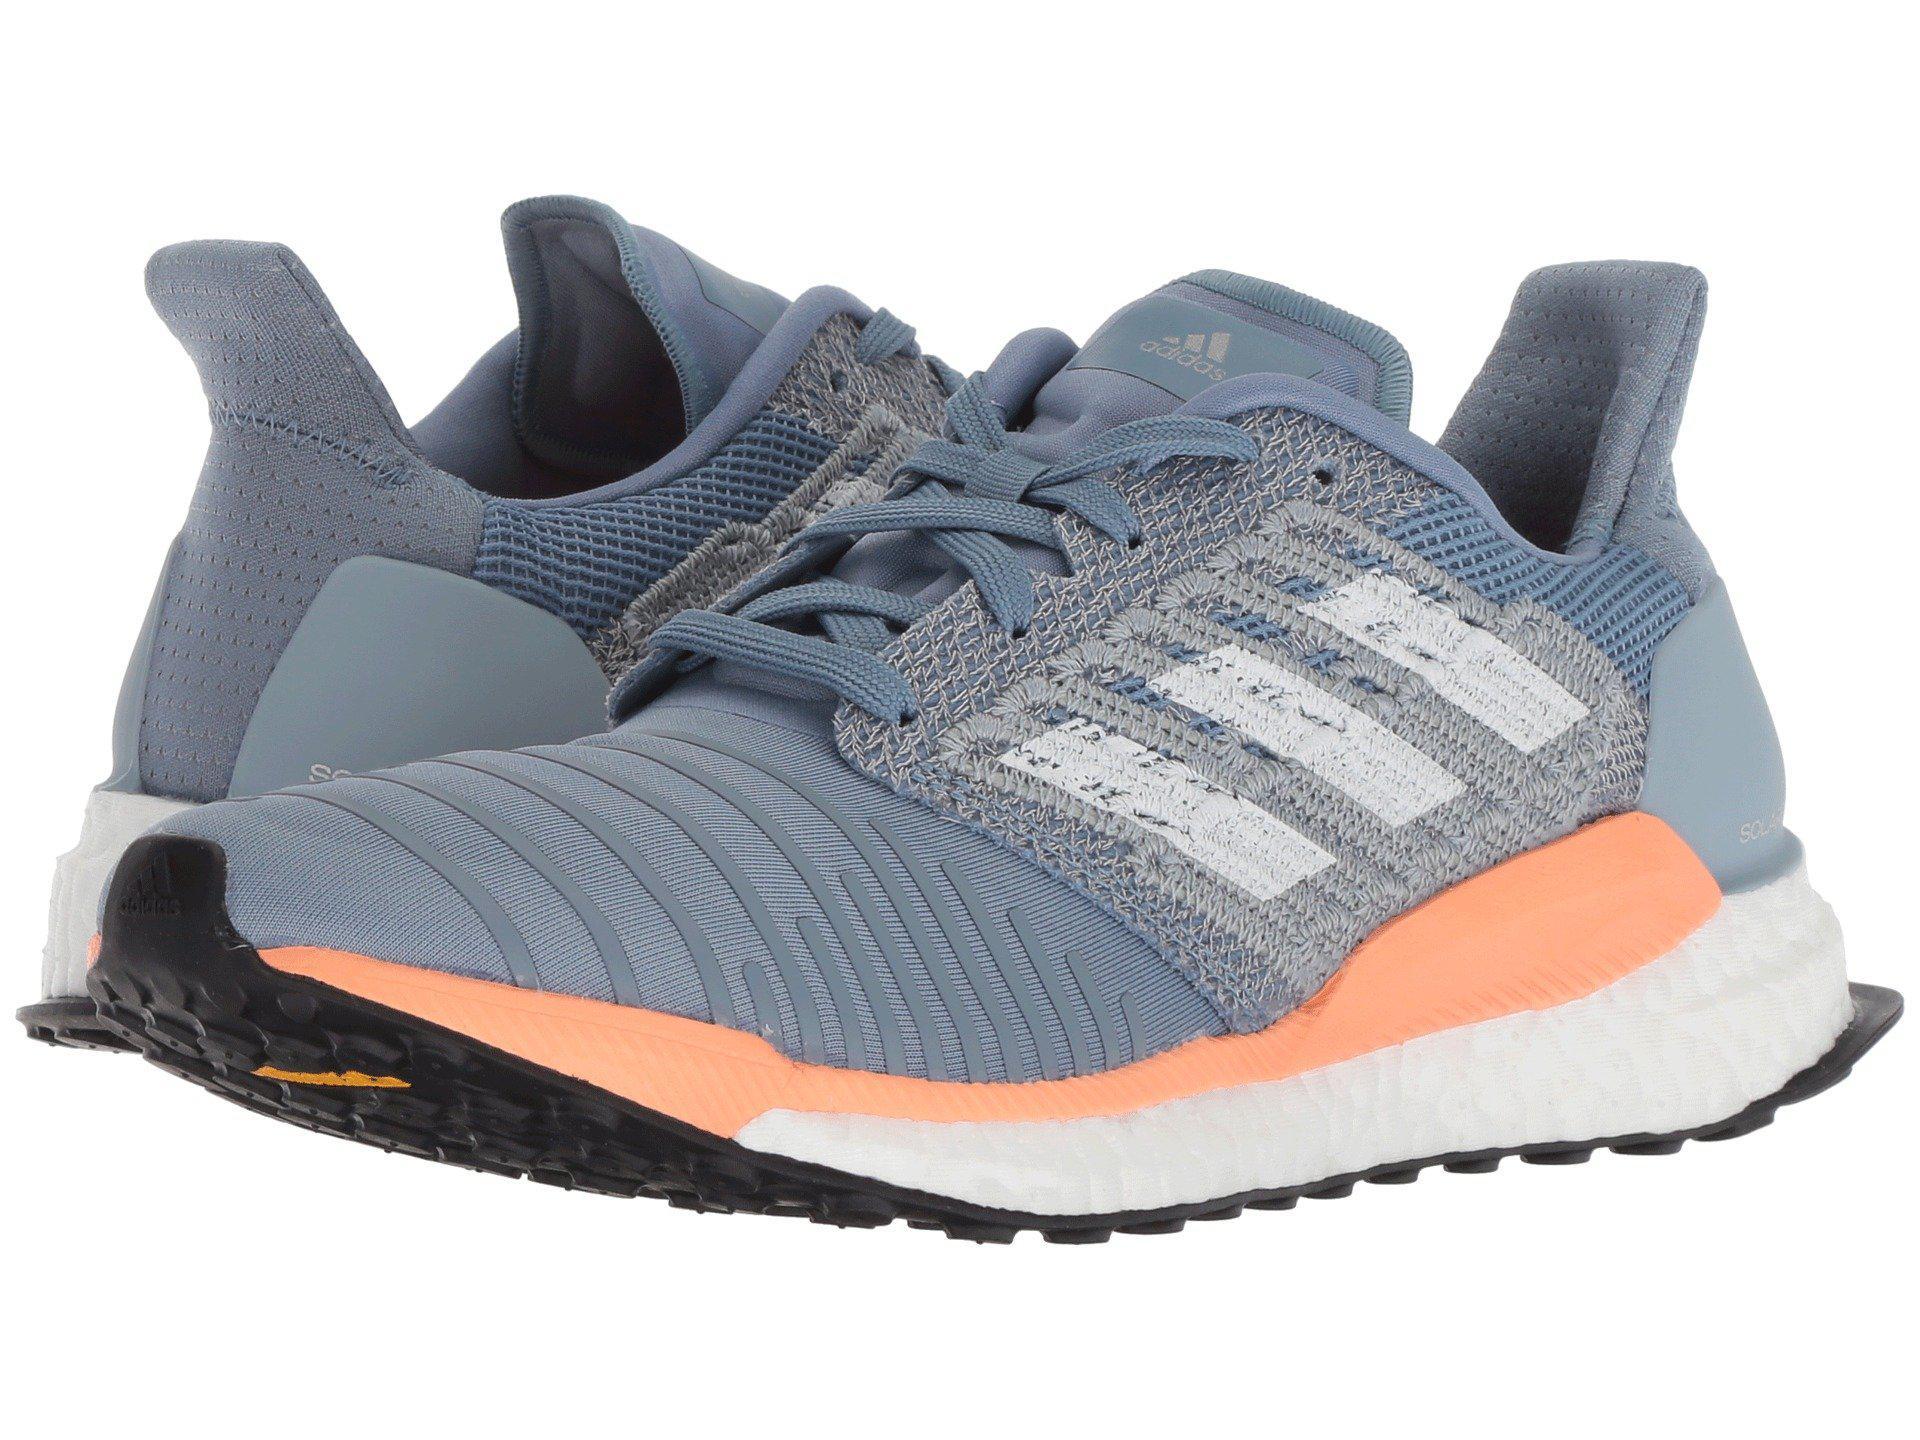 4a4e9aedfd975a adidas Originals. Solar Boost (core Black grey Four F17 ftwr White) Women s  Running Shoes